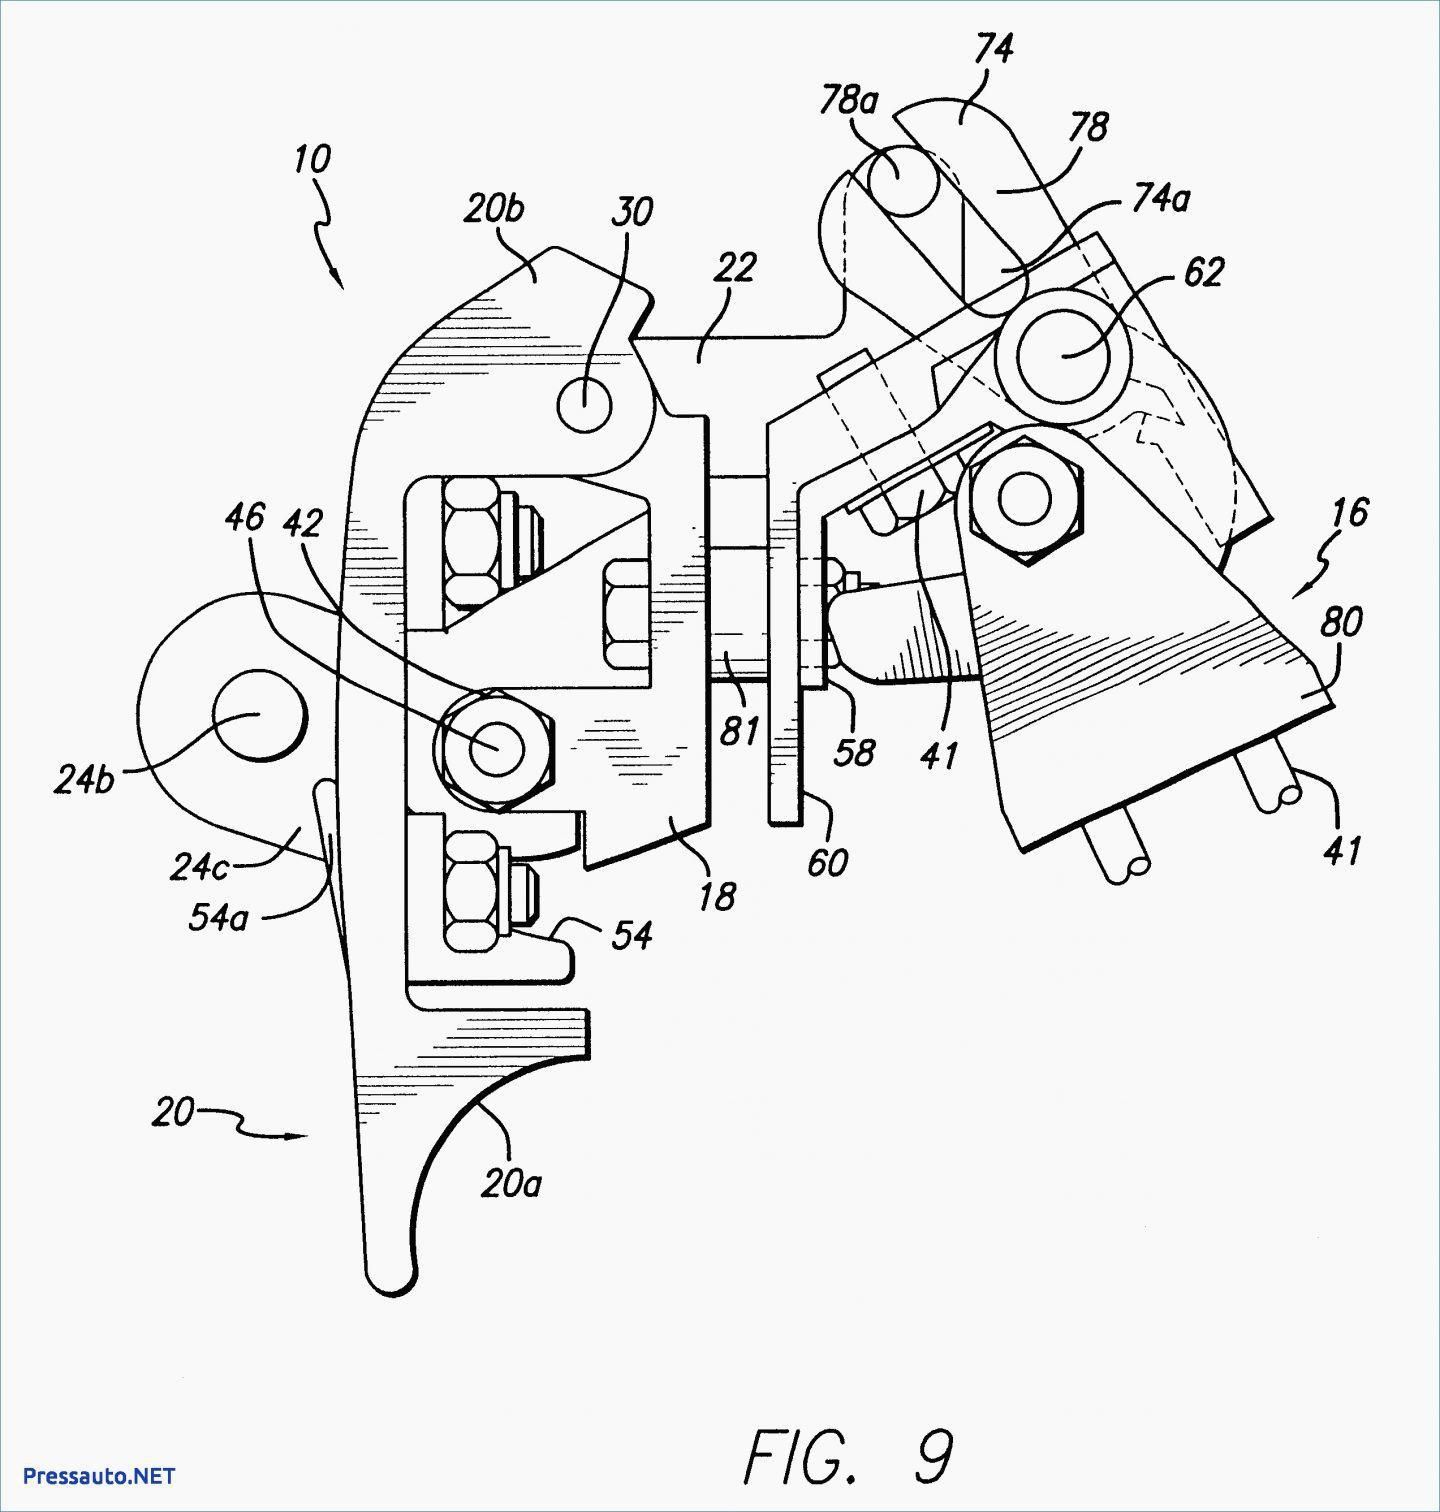 30 Amp Twist Lock Plug Wiring Diagram